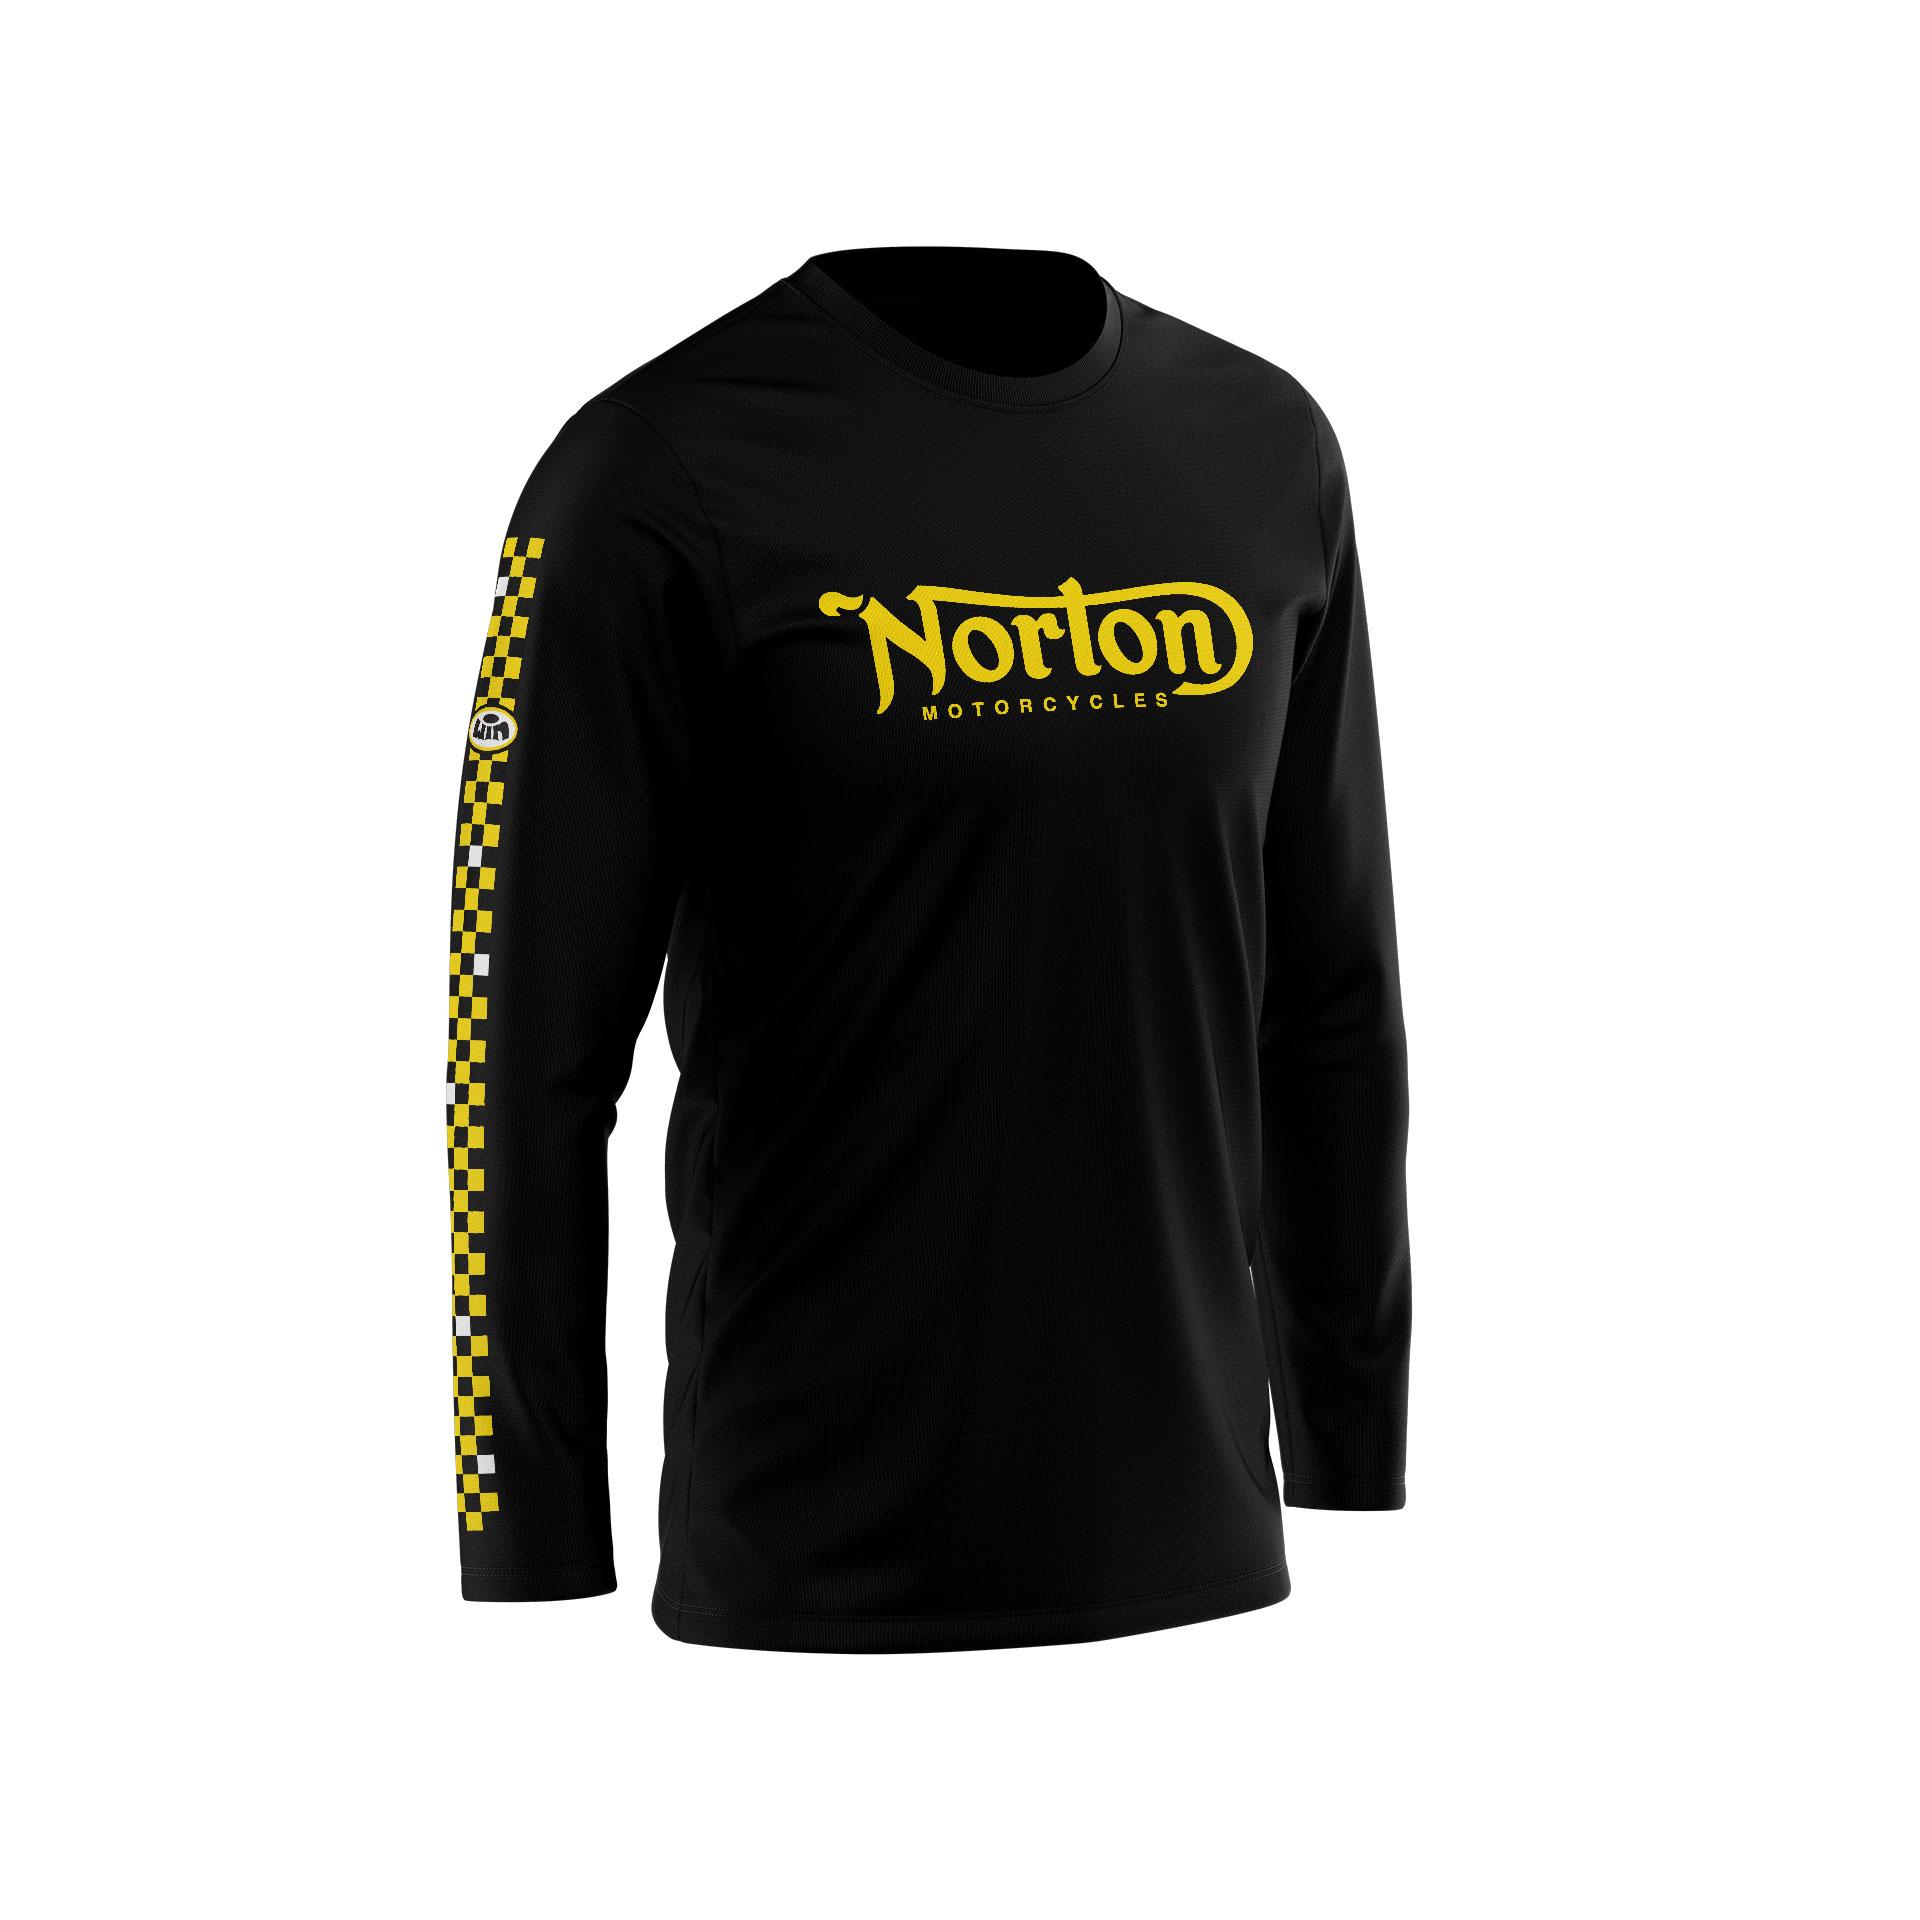 TSLS NORTON Noir - Jaune